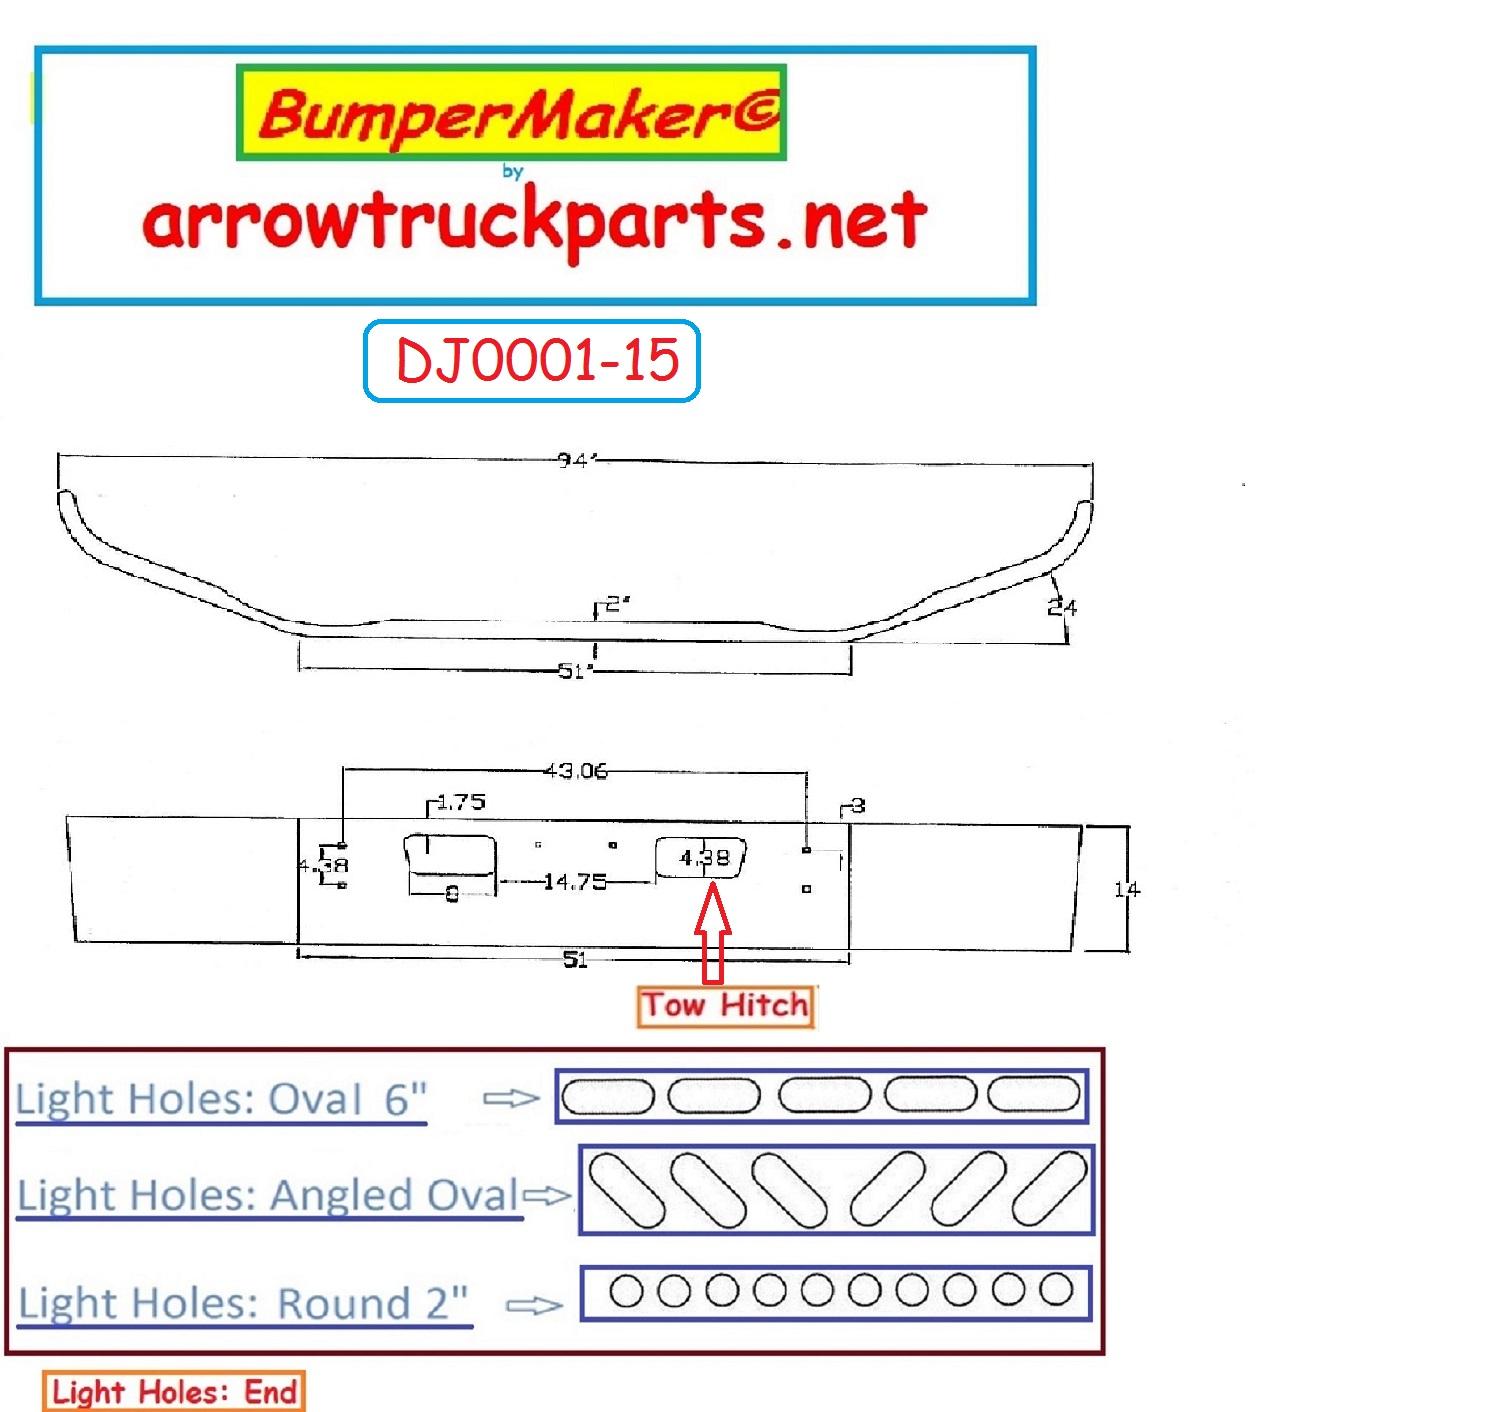 Bumpermaker Gmc Chevrolet C6500 C7500 Bumper 2004 To 2008 Mack Pinnacle Fuse Diagram